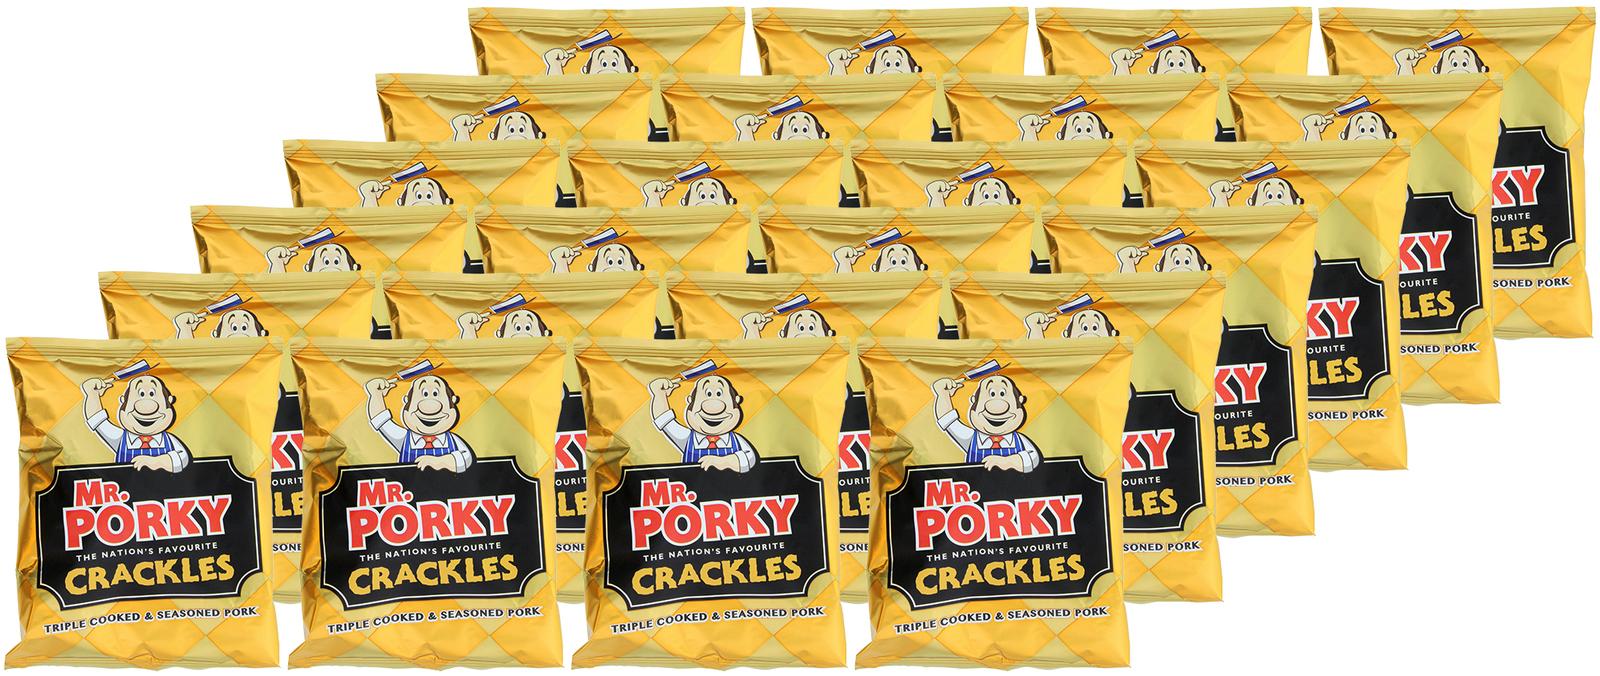 Mr. Porky Pork Crackles (24 x 45g) image